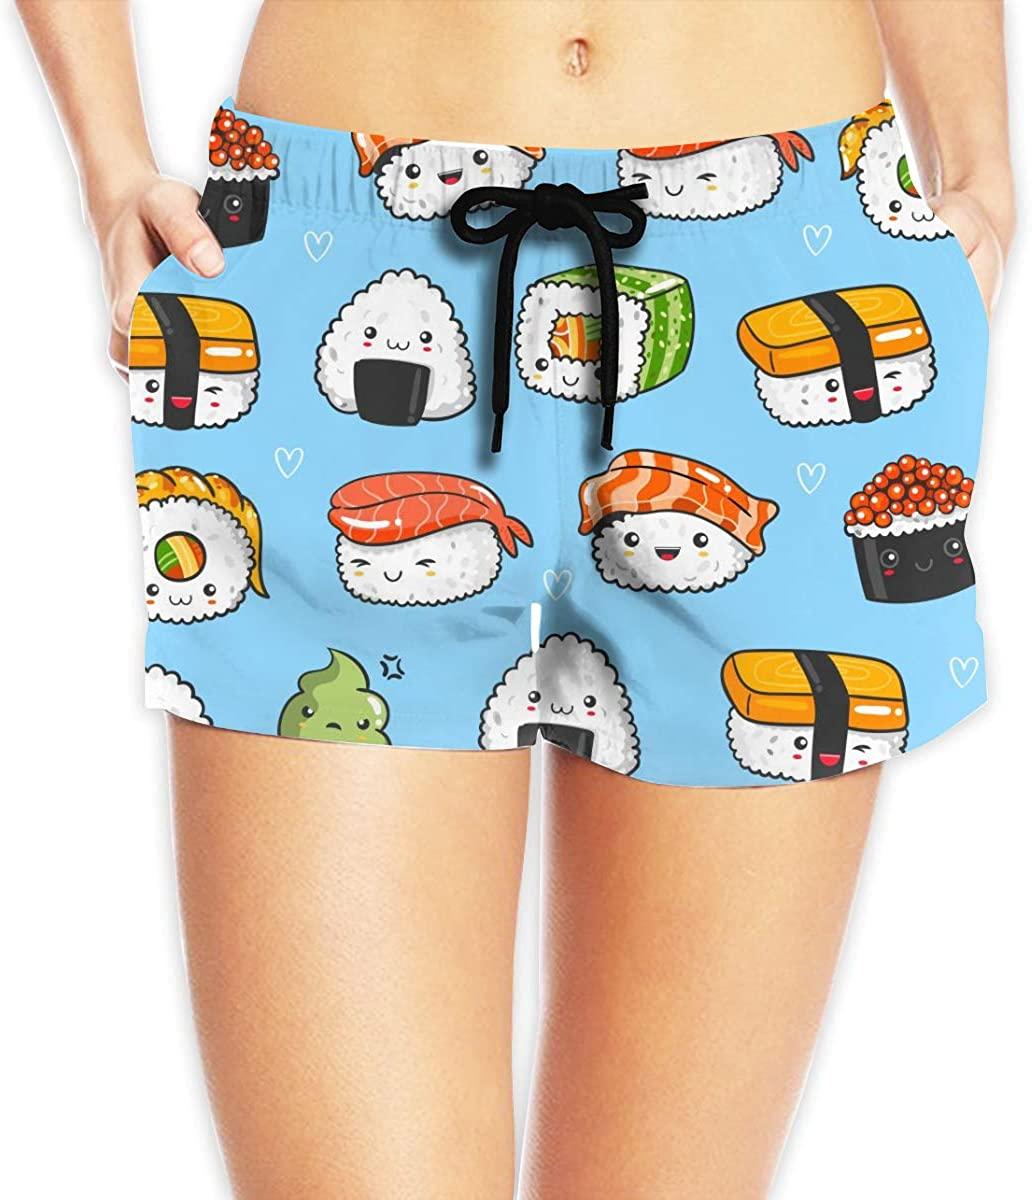 MOCSTONE Kawaii Sushi Women's Beach Shorts Board Shorts with Pocket Swimming Trunks